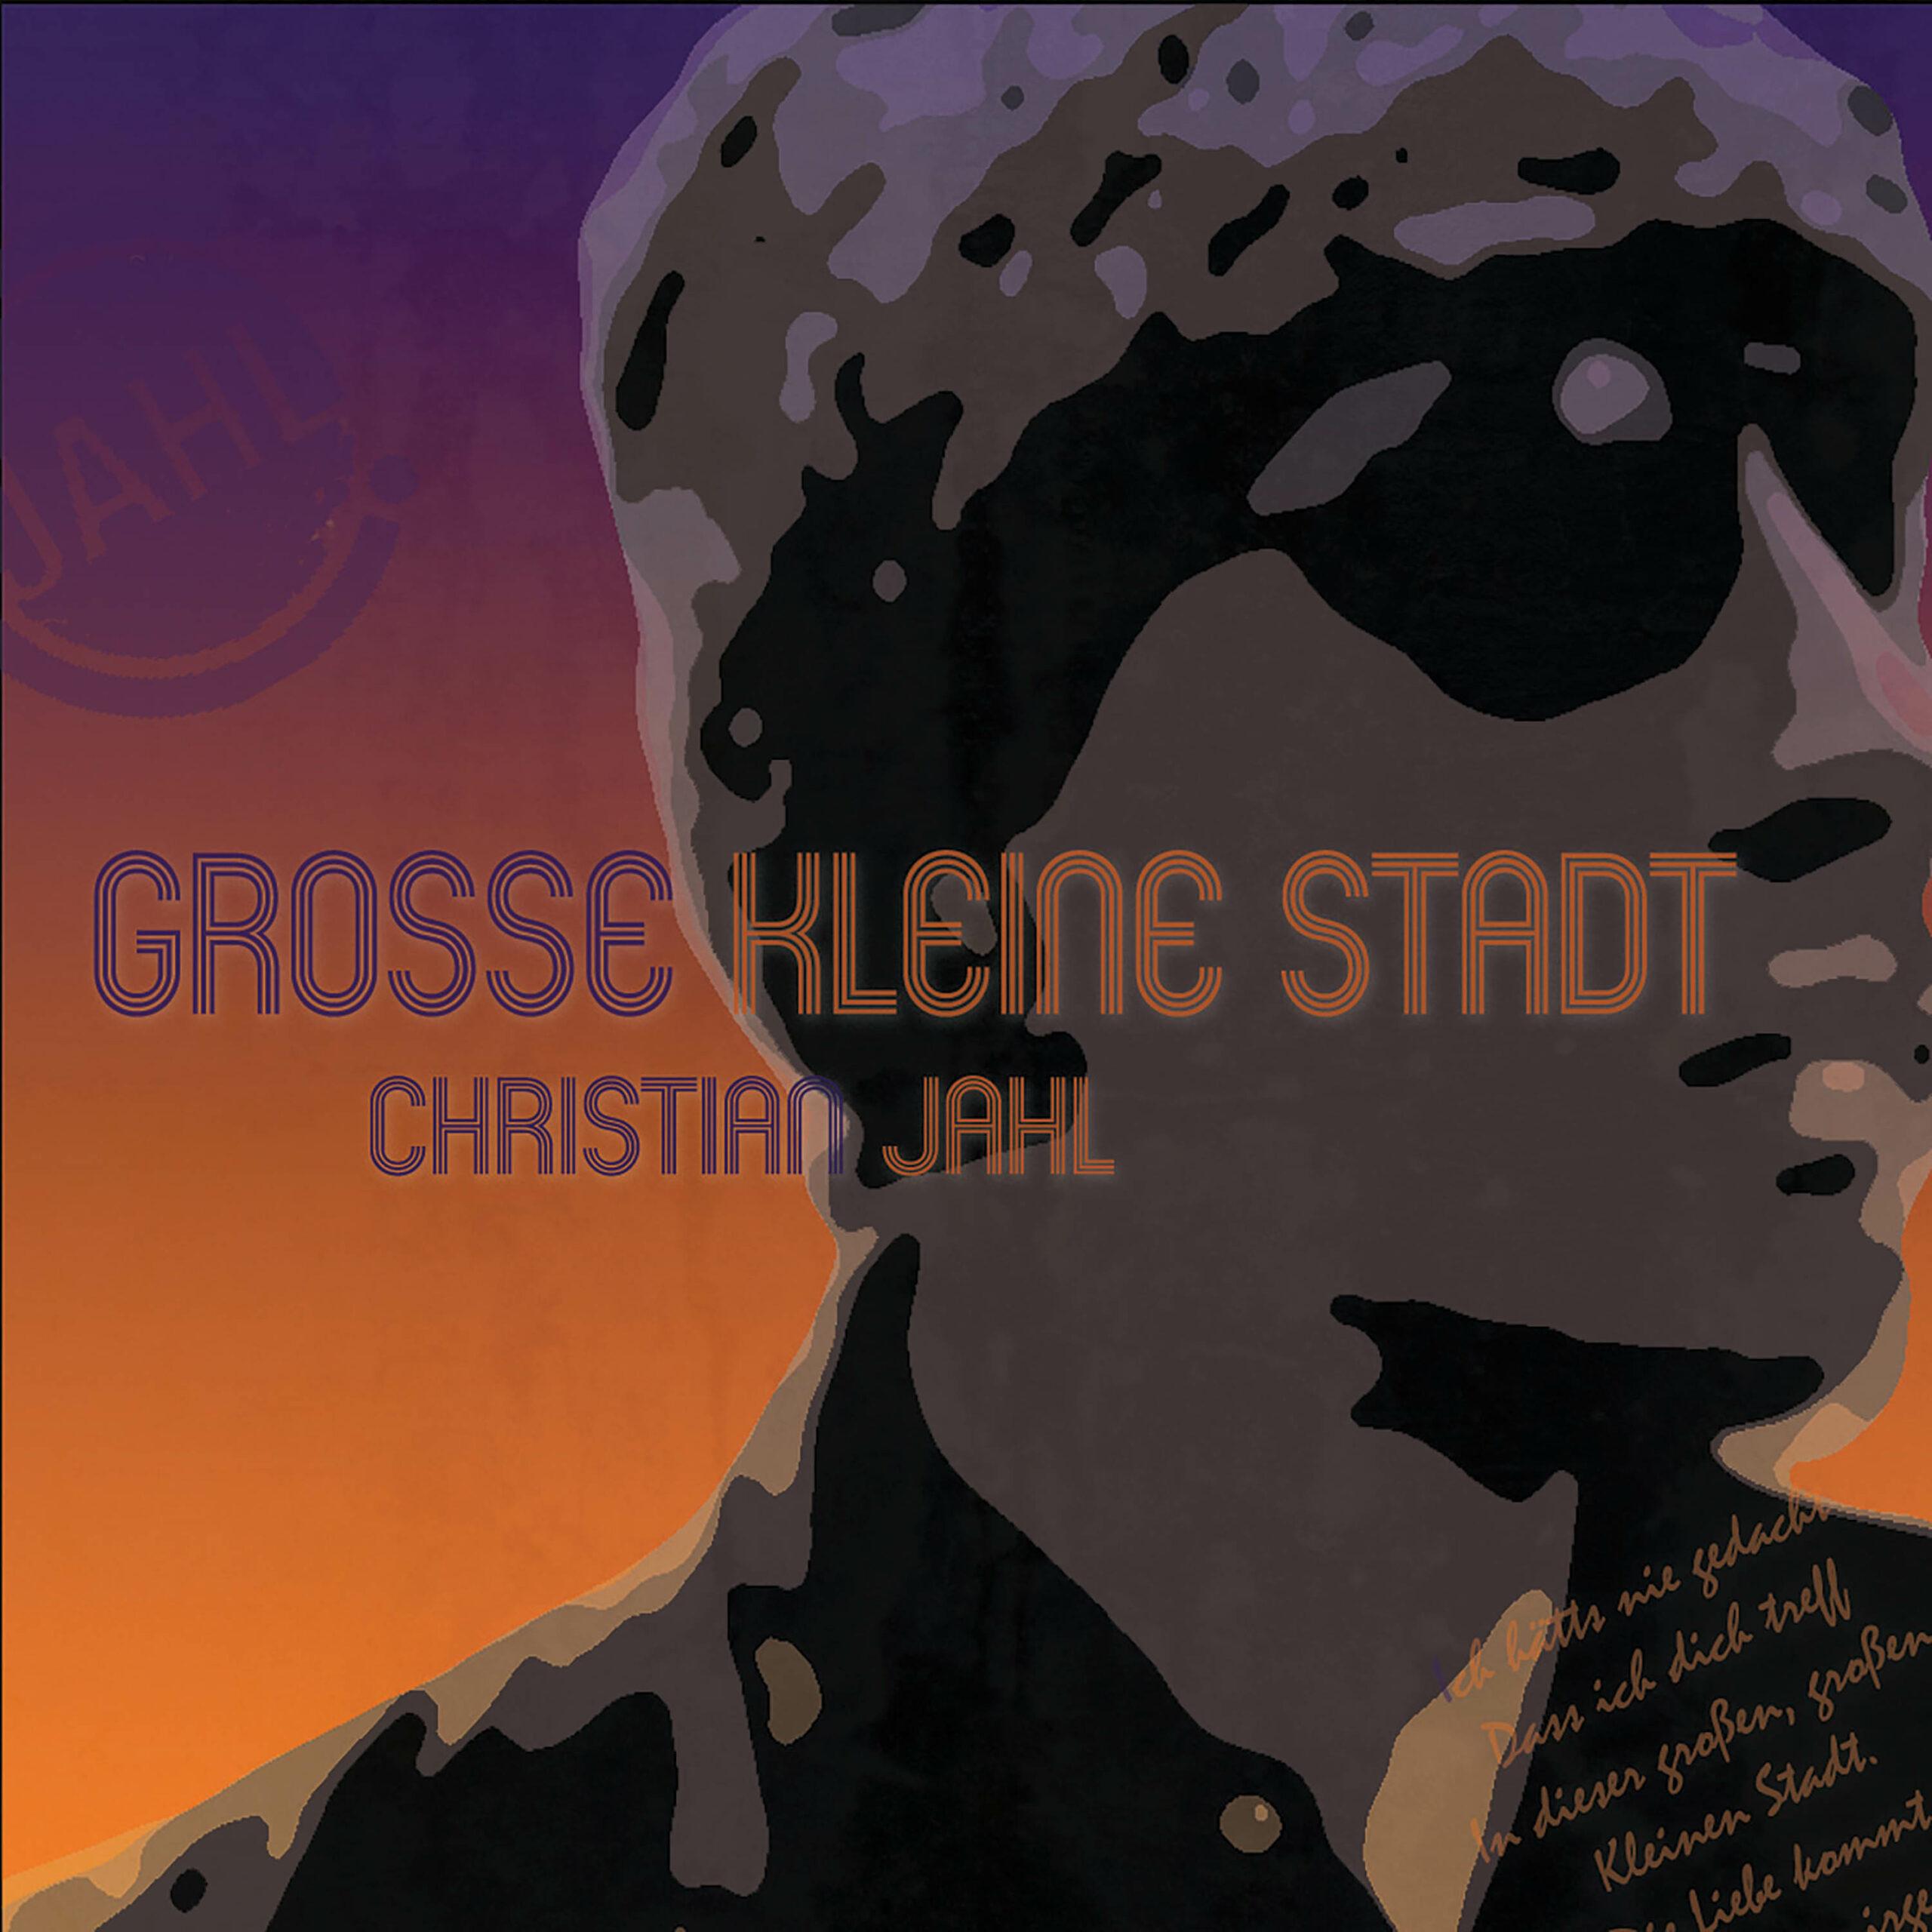 Christian Jahl